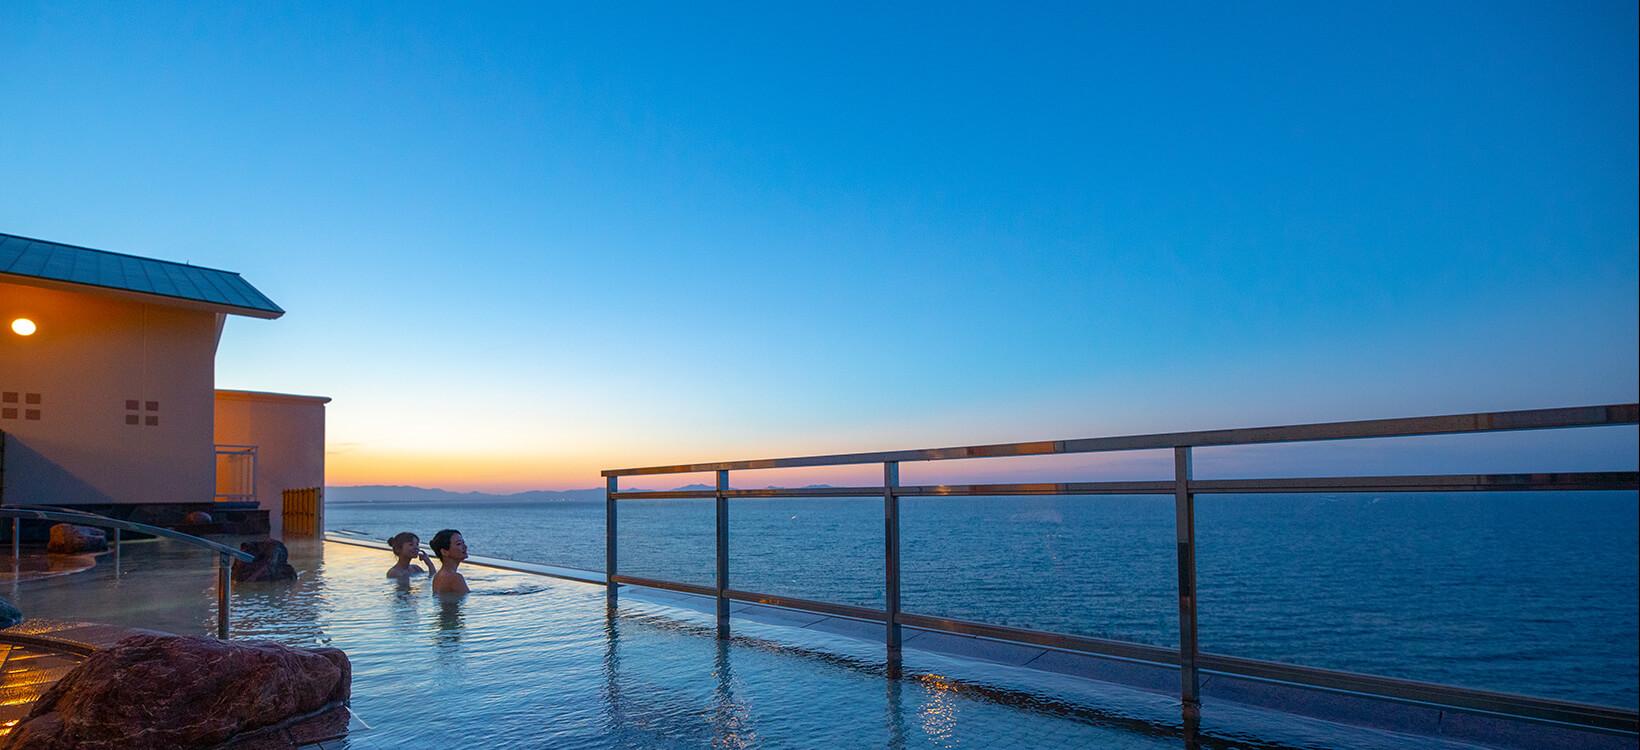 Open-air bath 満天の湯 インフィニティ天空露天風呂